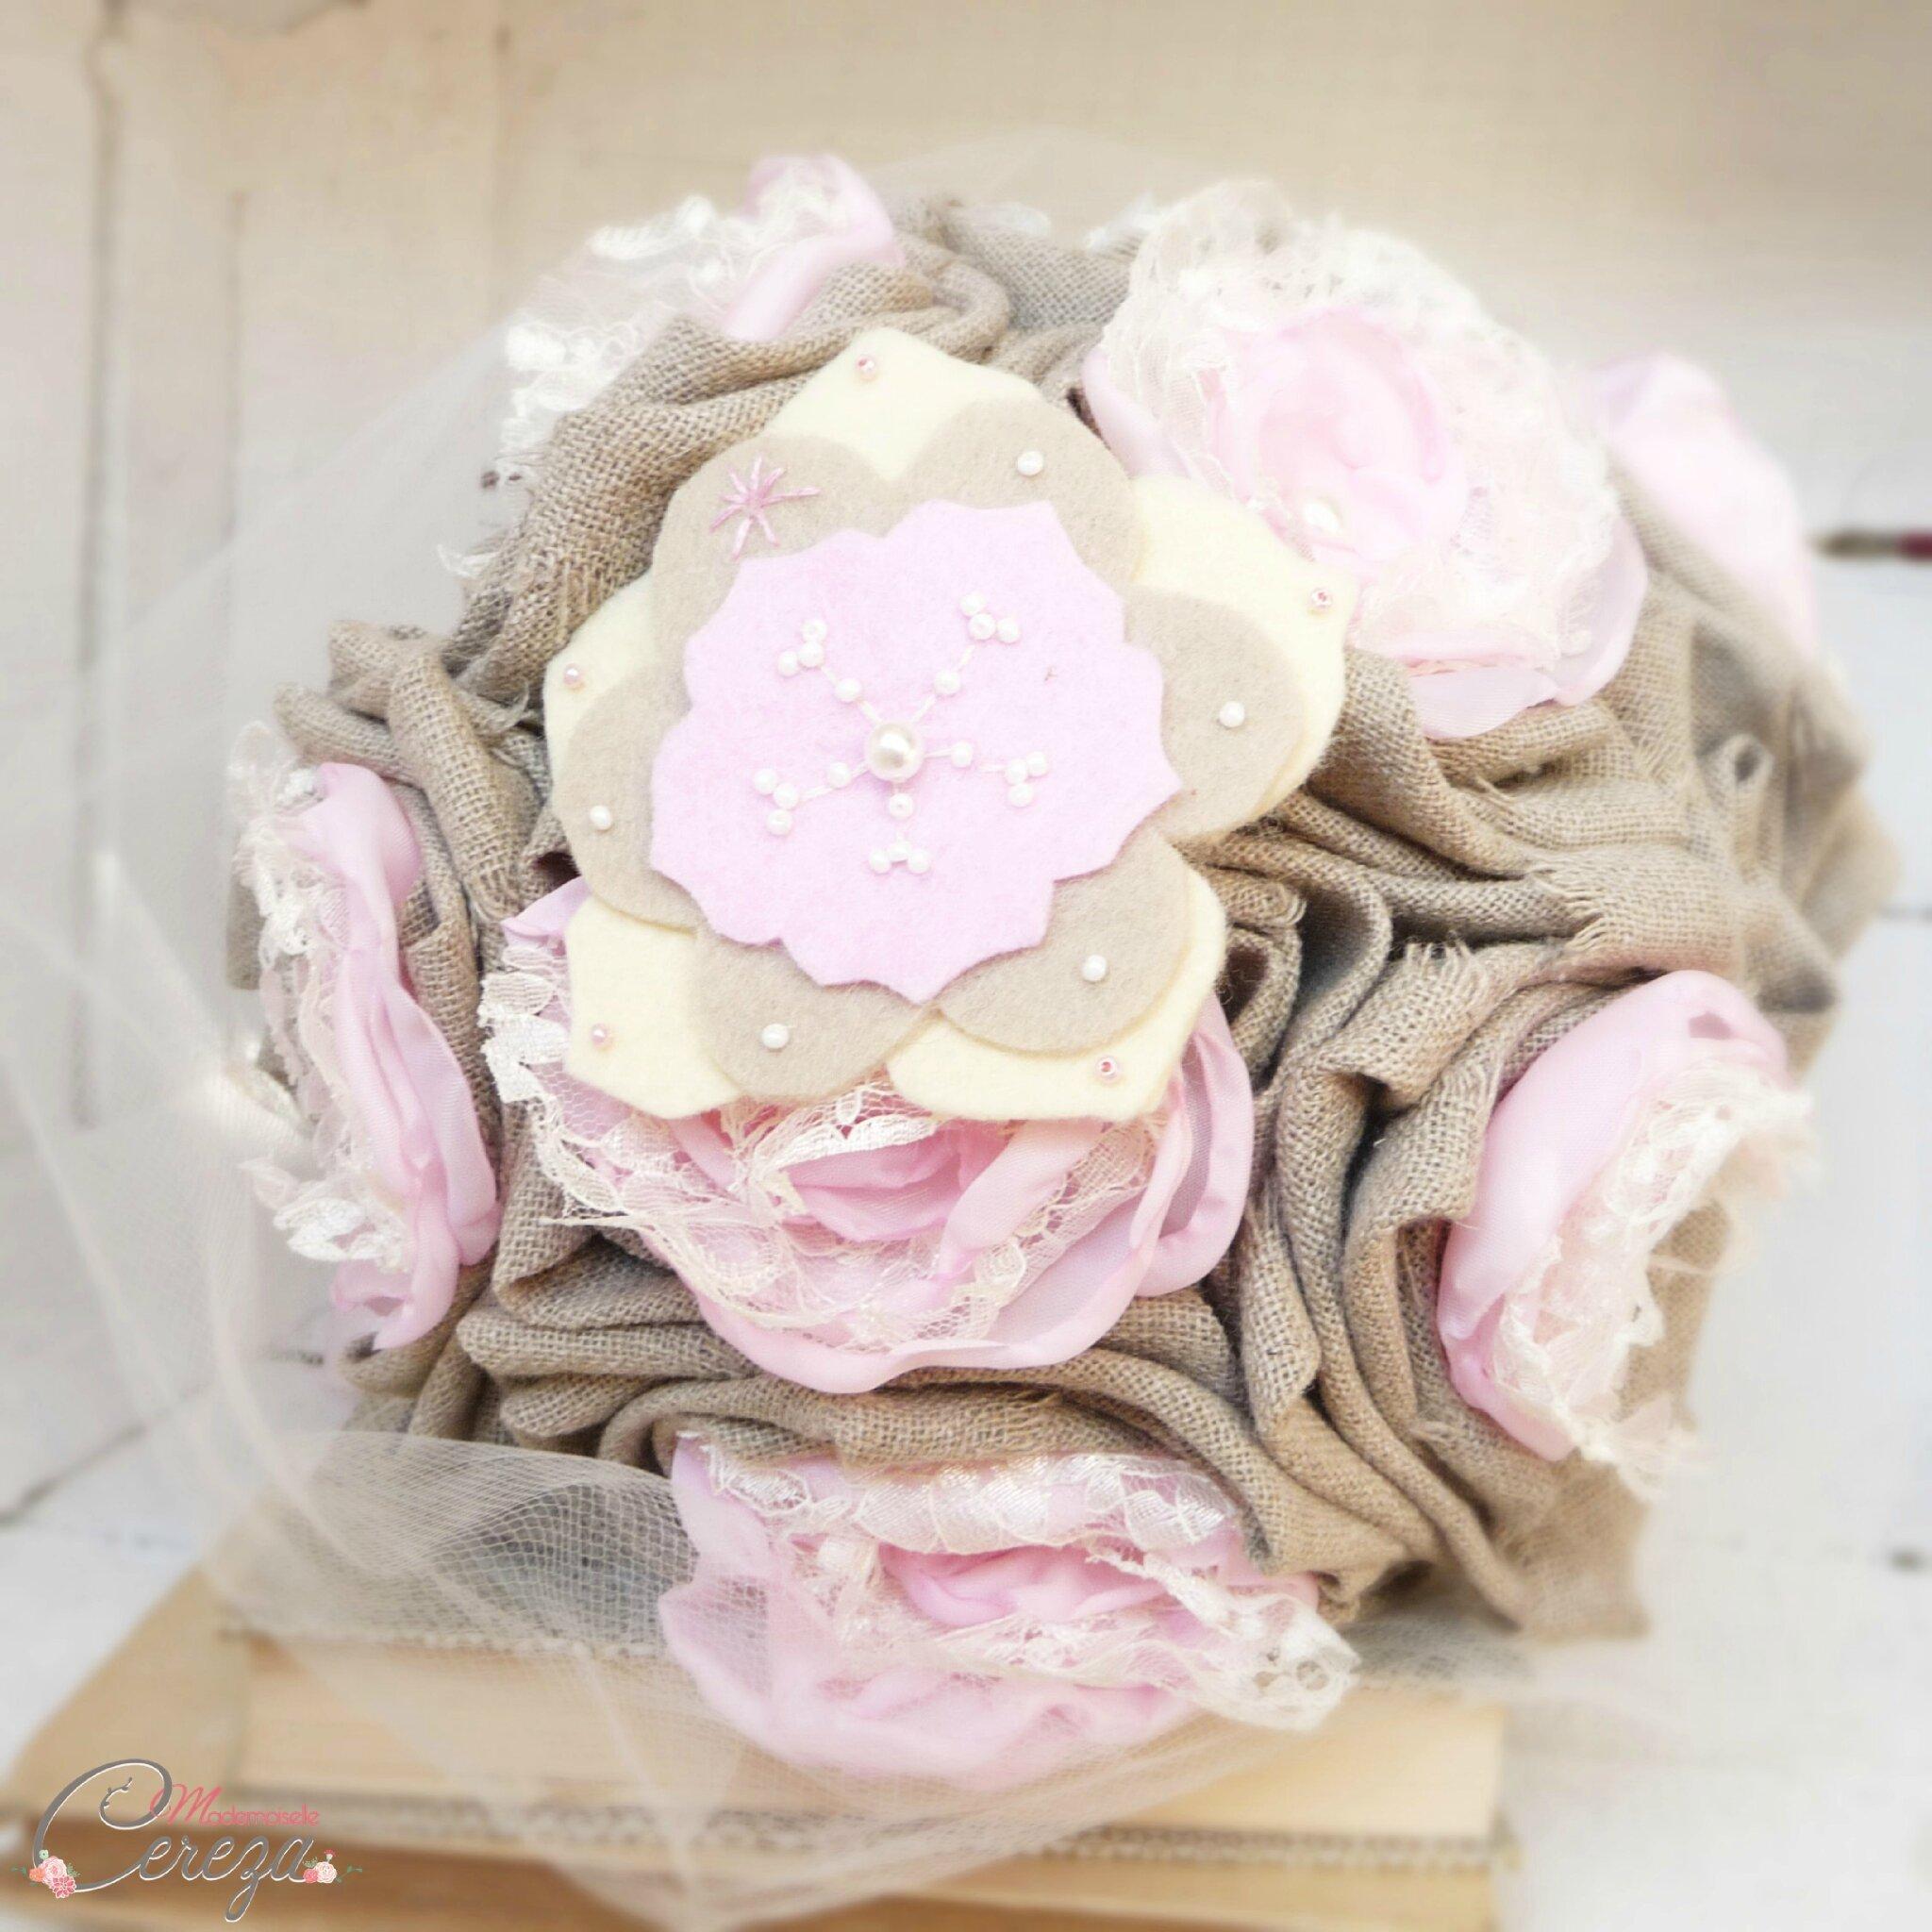 mariage-campagne-champetre-chic-hivernal-bouquet-mariee-lin-beige-dentelle-rose-perles-sur-mesure-Lola-Mademoiselle-Cereza-Deco